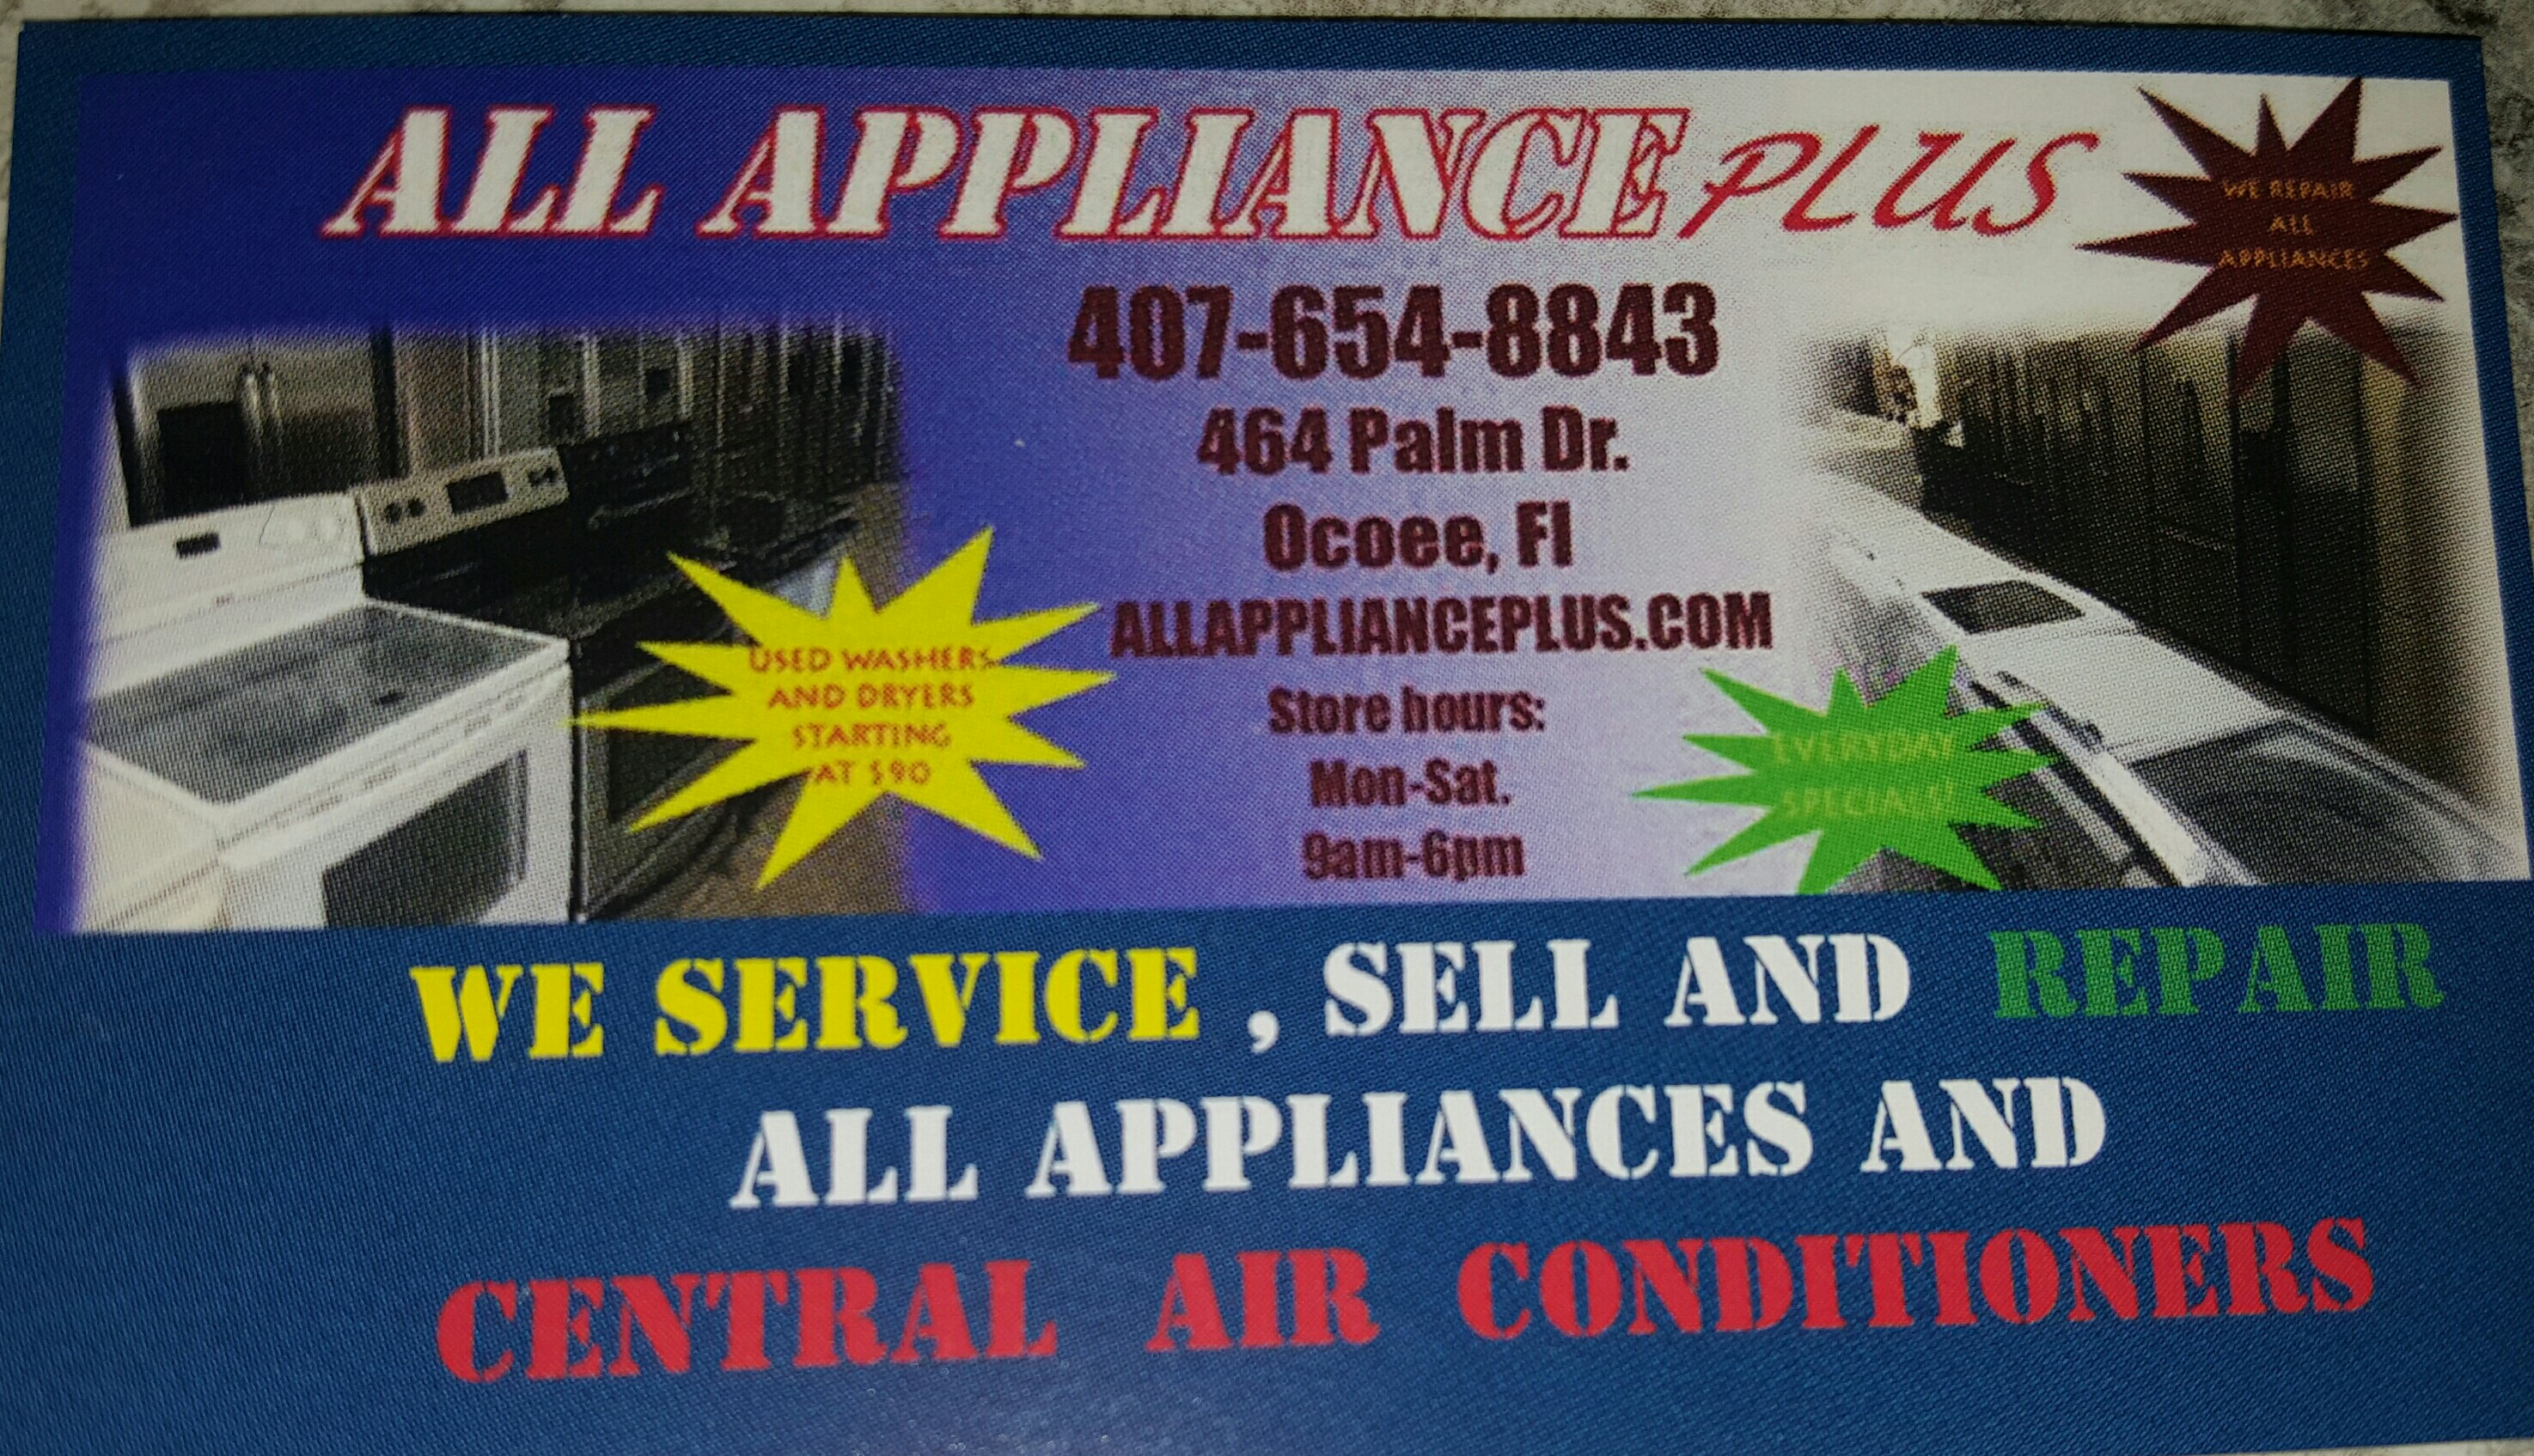 All Appliance plus